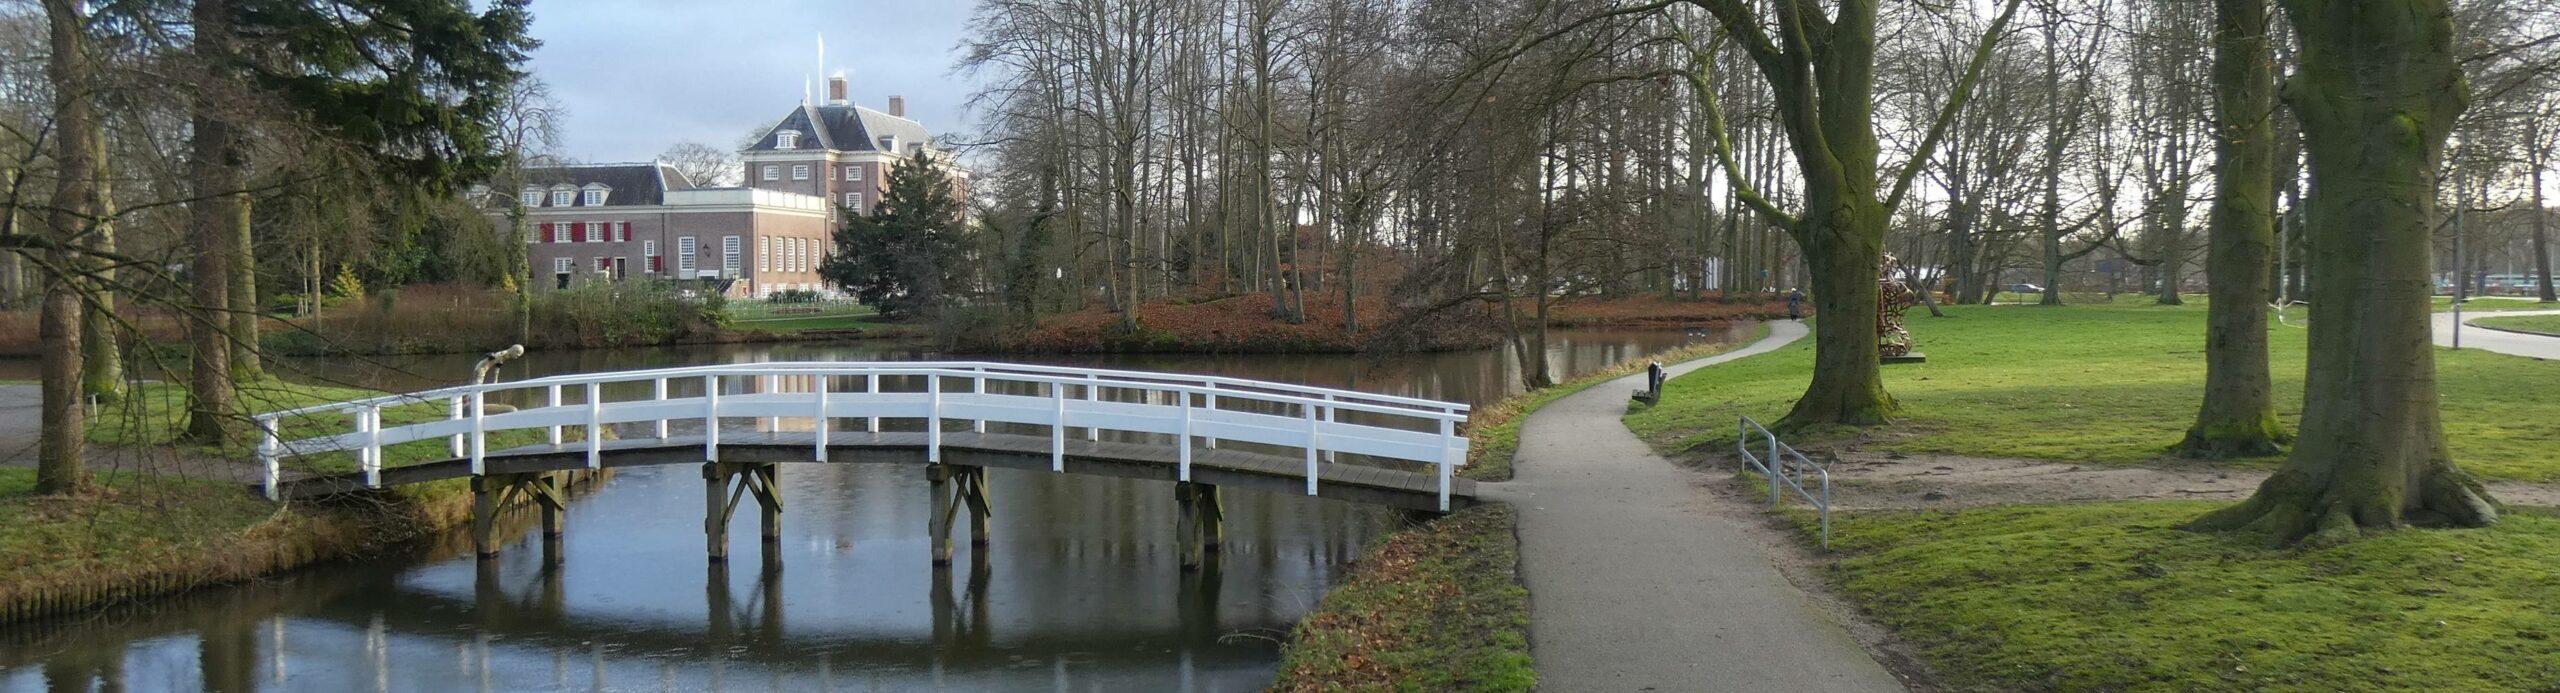 NDZ Zeist Slotpark NieuwDemocratischZeist